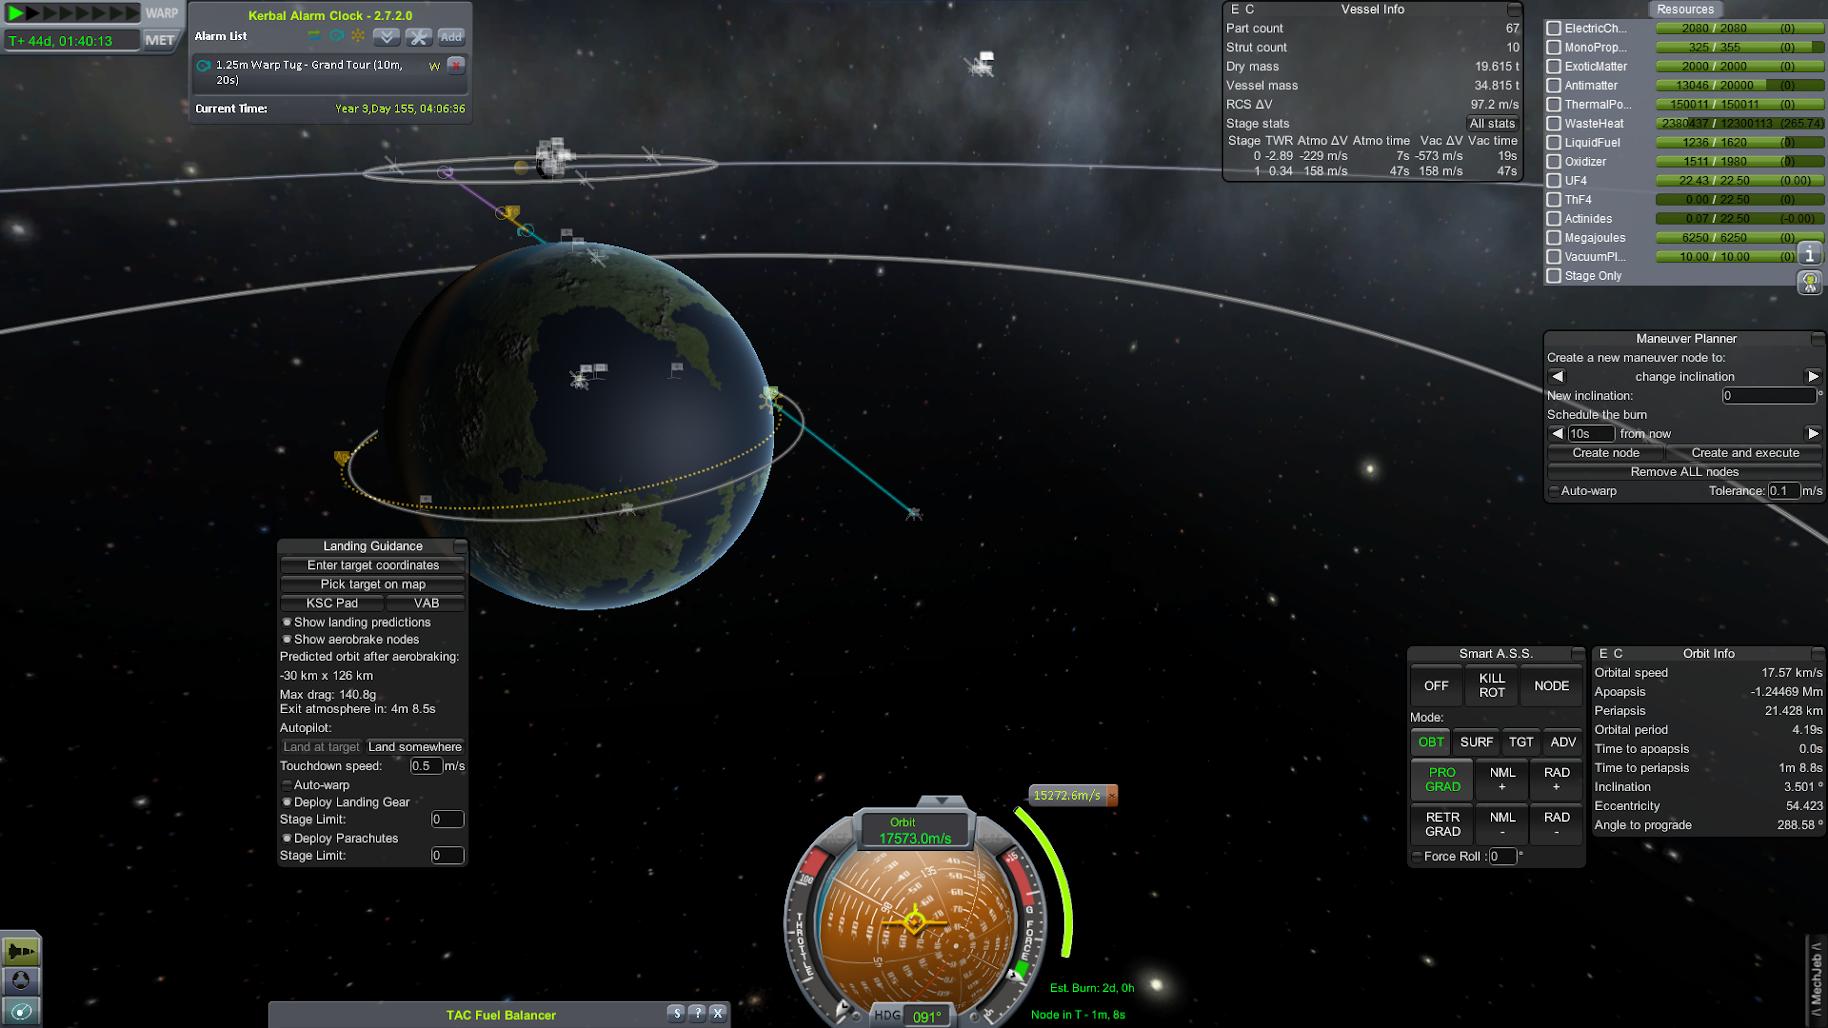 screenshot115.png